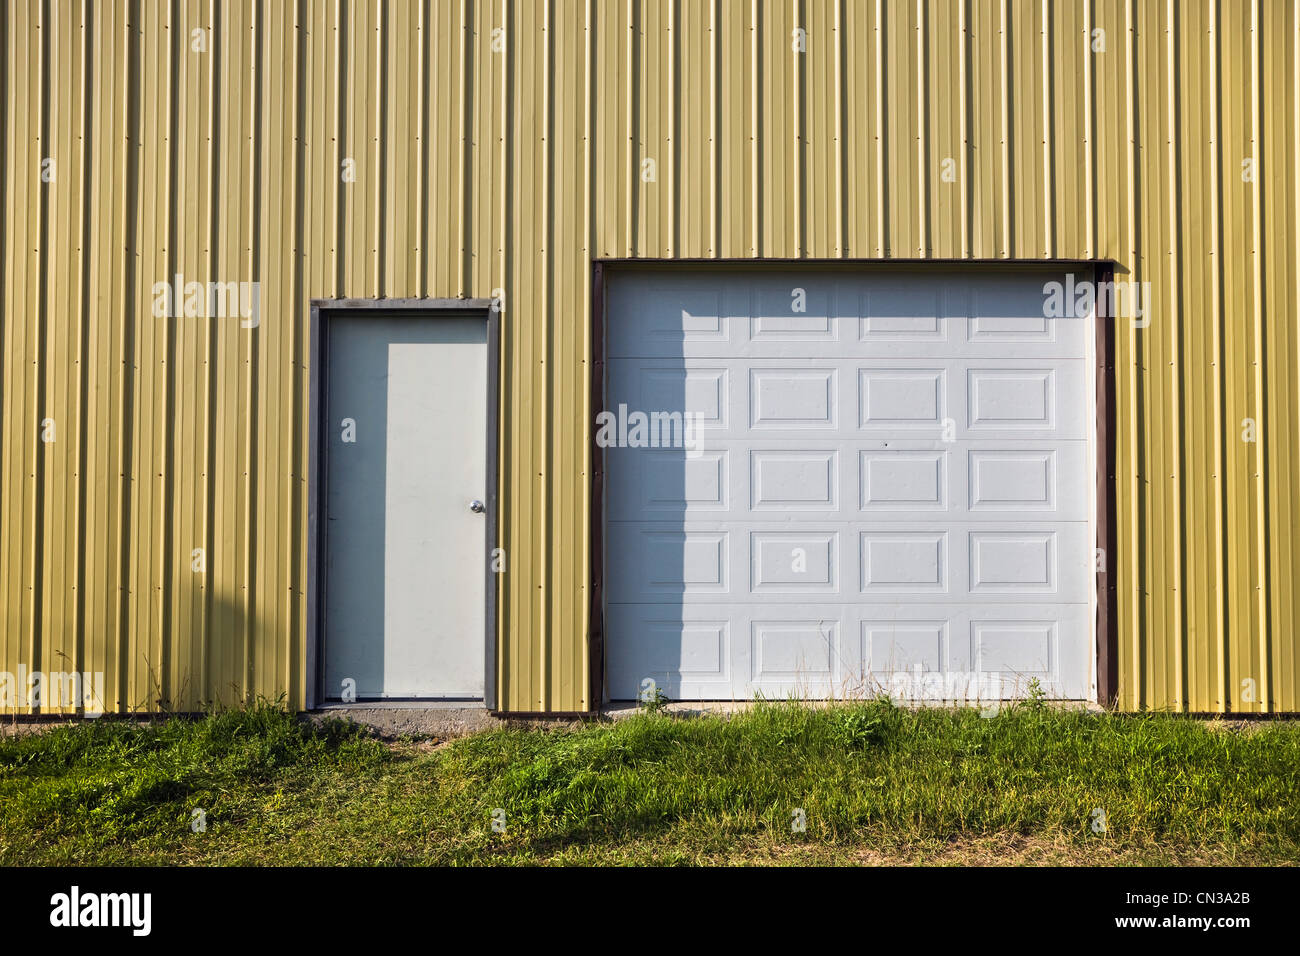 Doors in a building - Stock Image